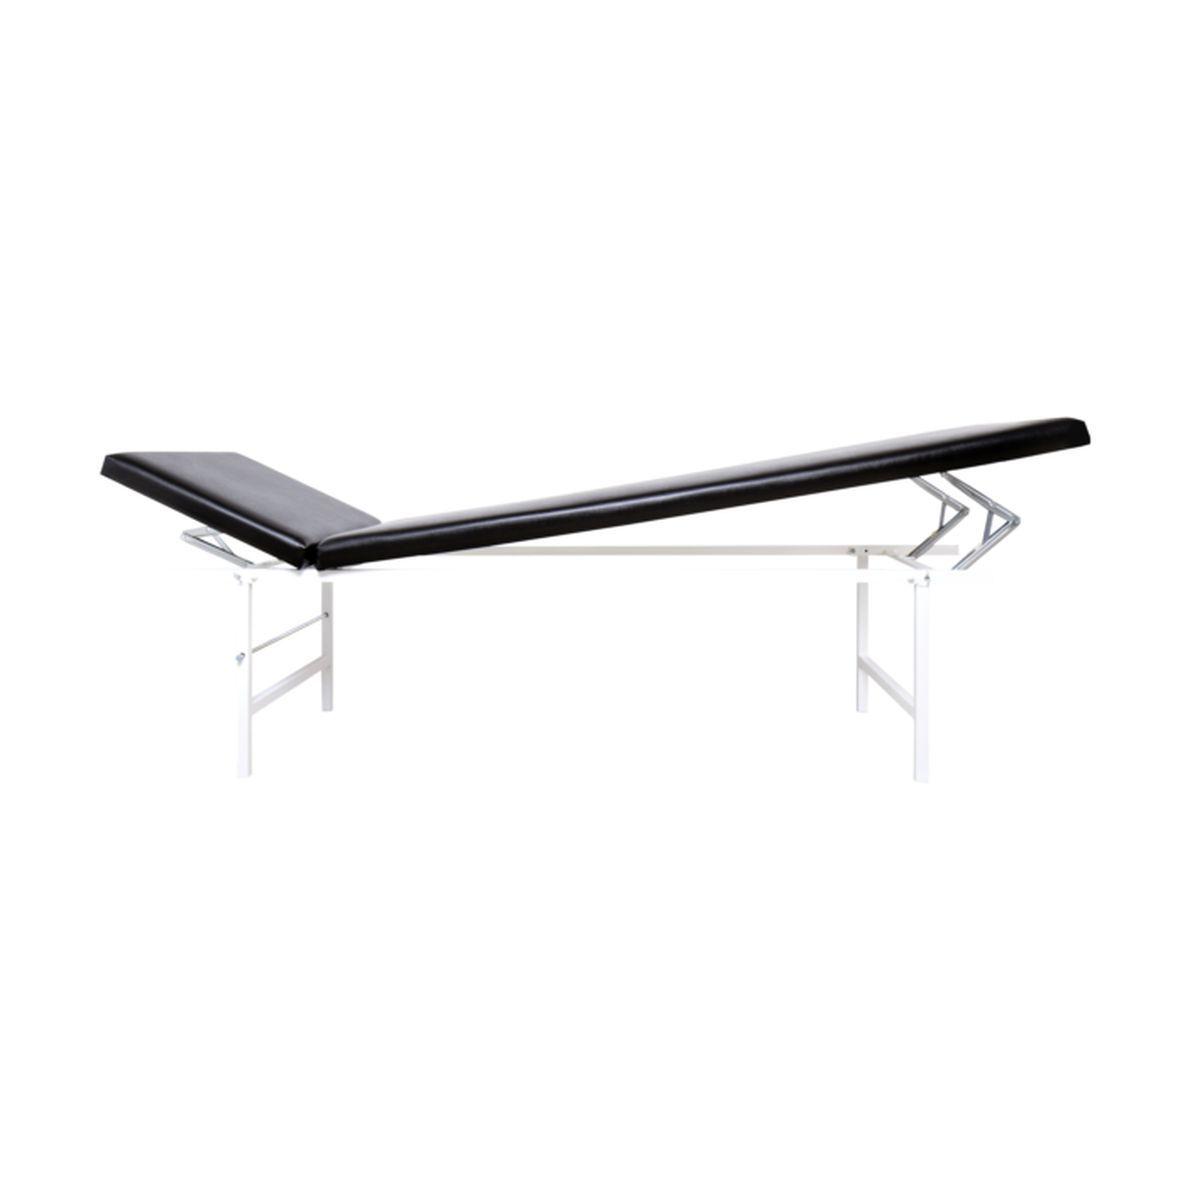 ruheraumliege stahlrohr kopf u fu teil verst ocker online. Black Bedroom Furniture Sets. Home Design Ideas